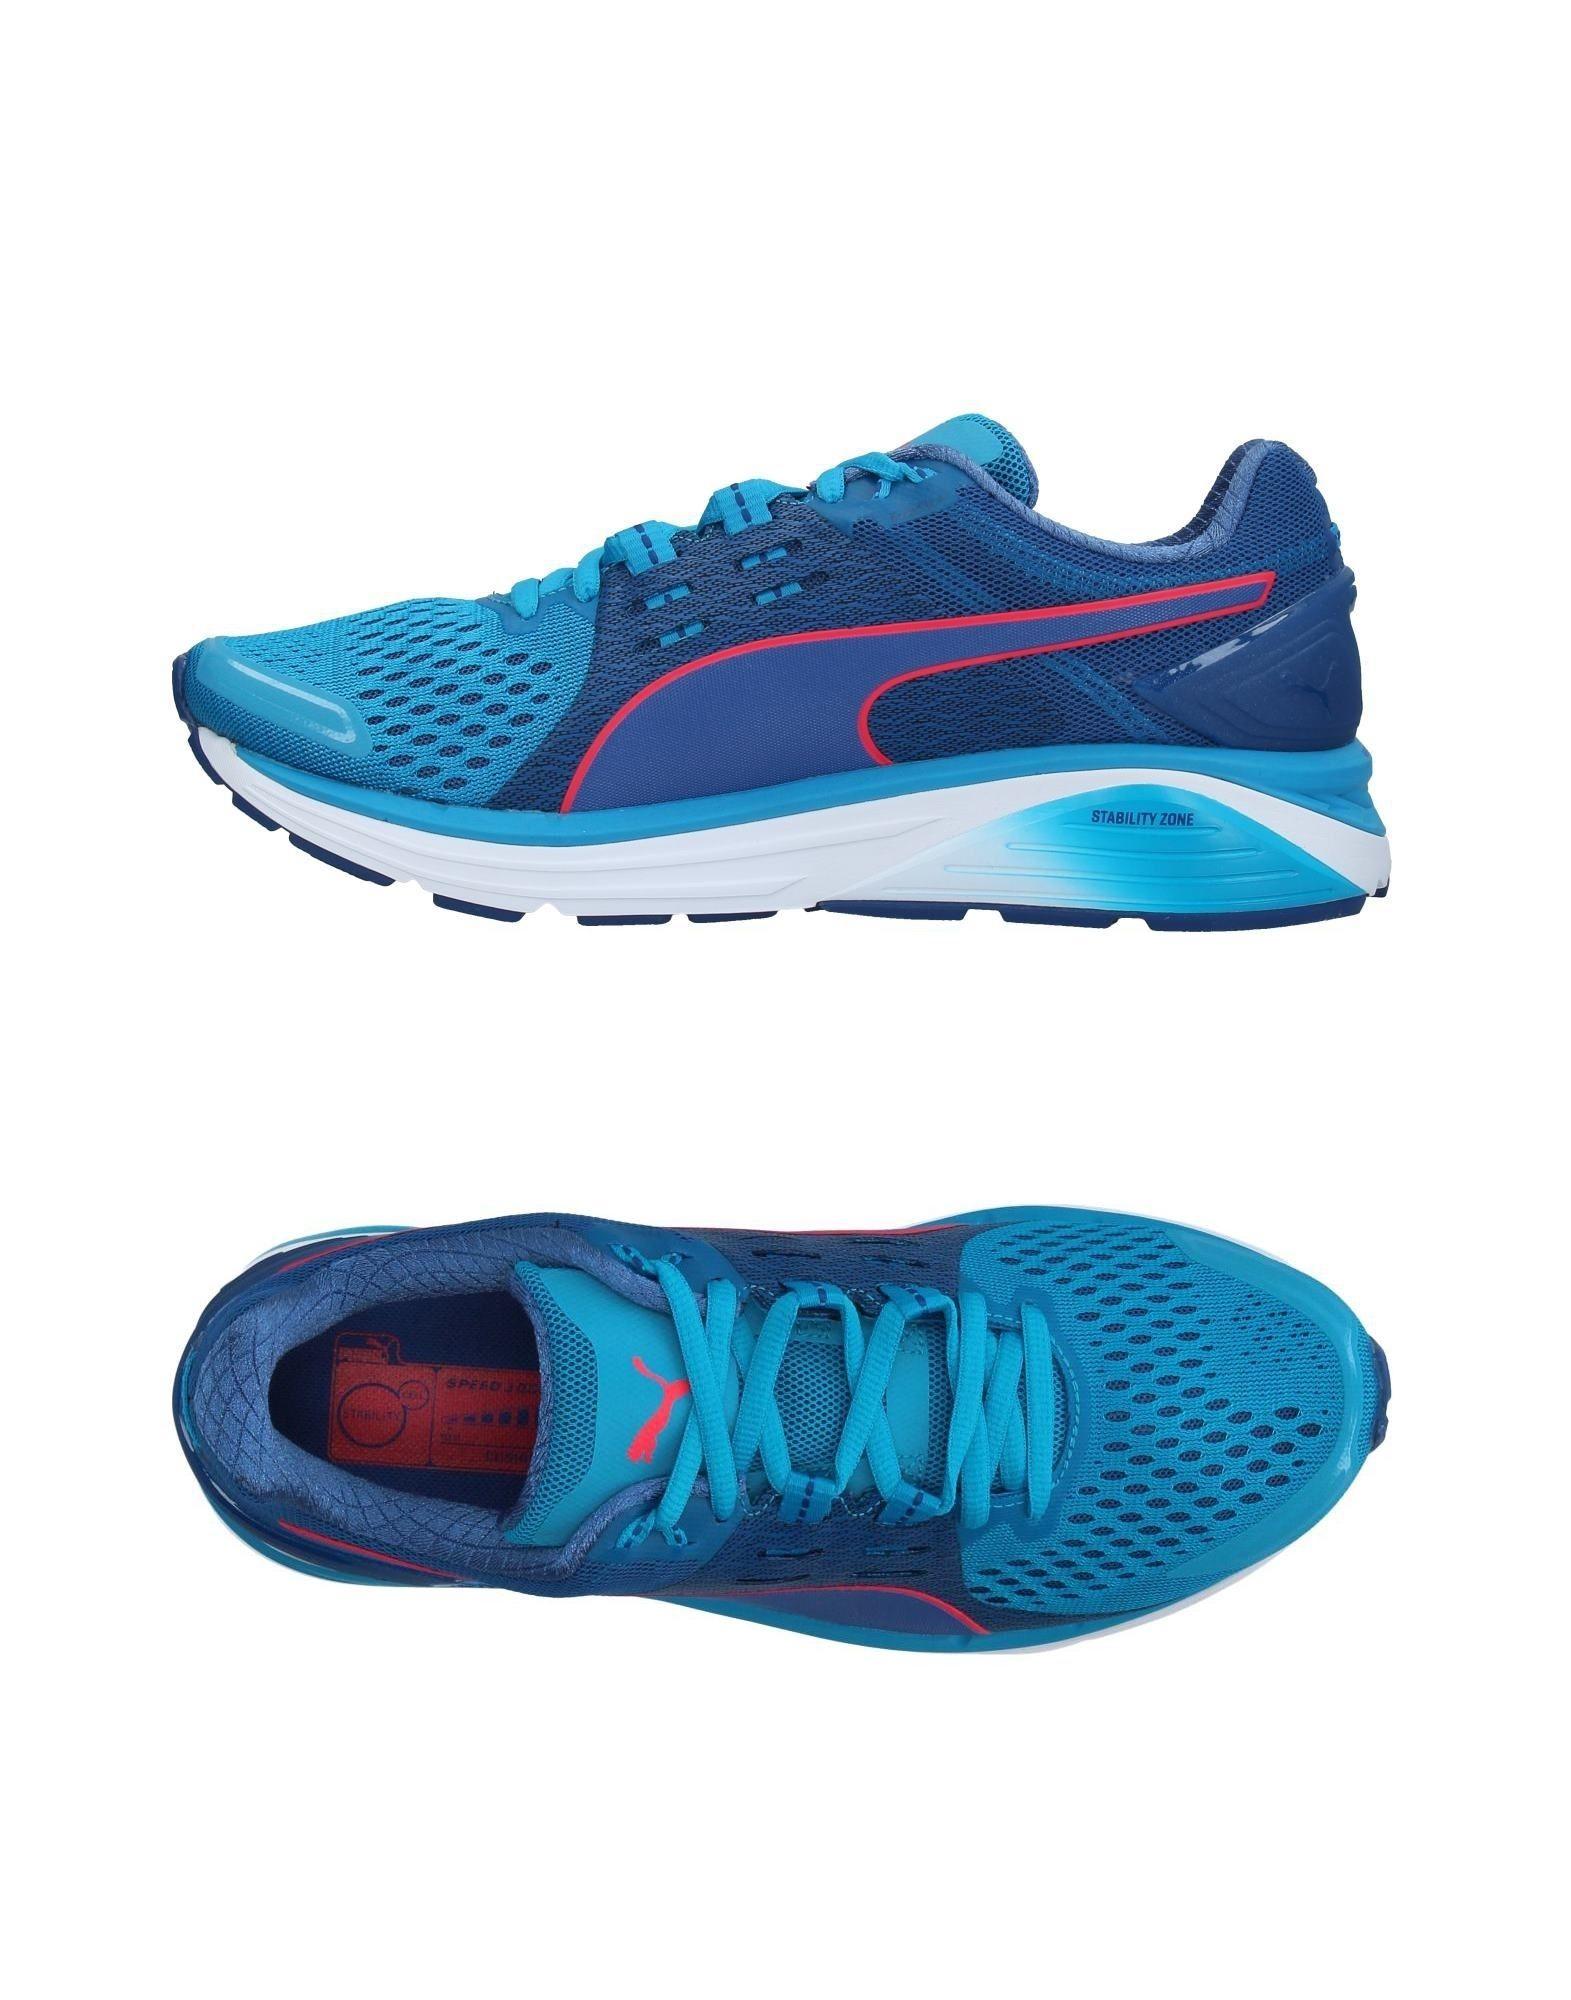 Rabatt echte Schuhe Herren Puma Sneakers Herren Schuhe  11333706RB c7ea50